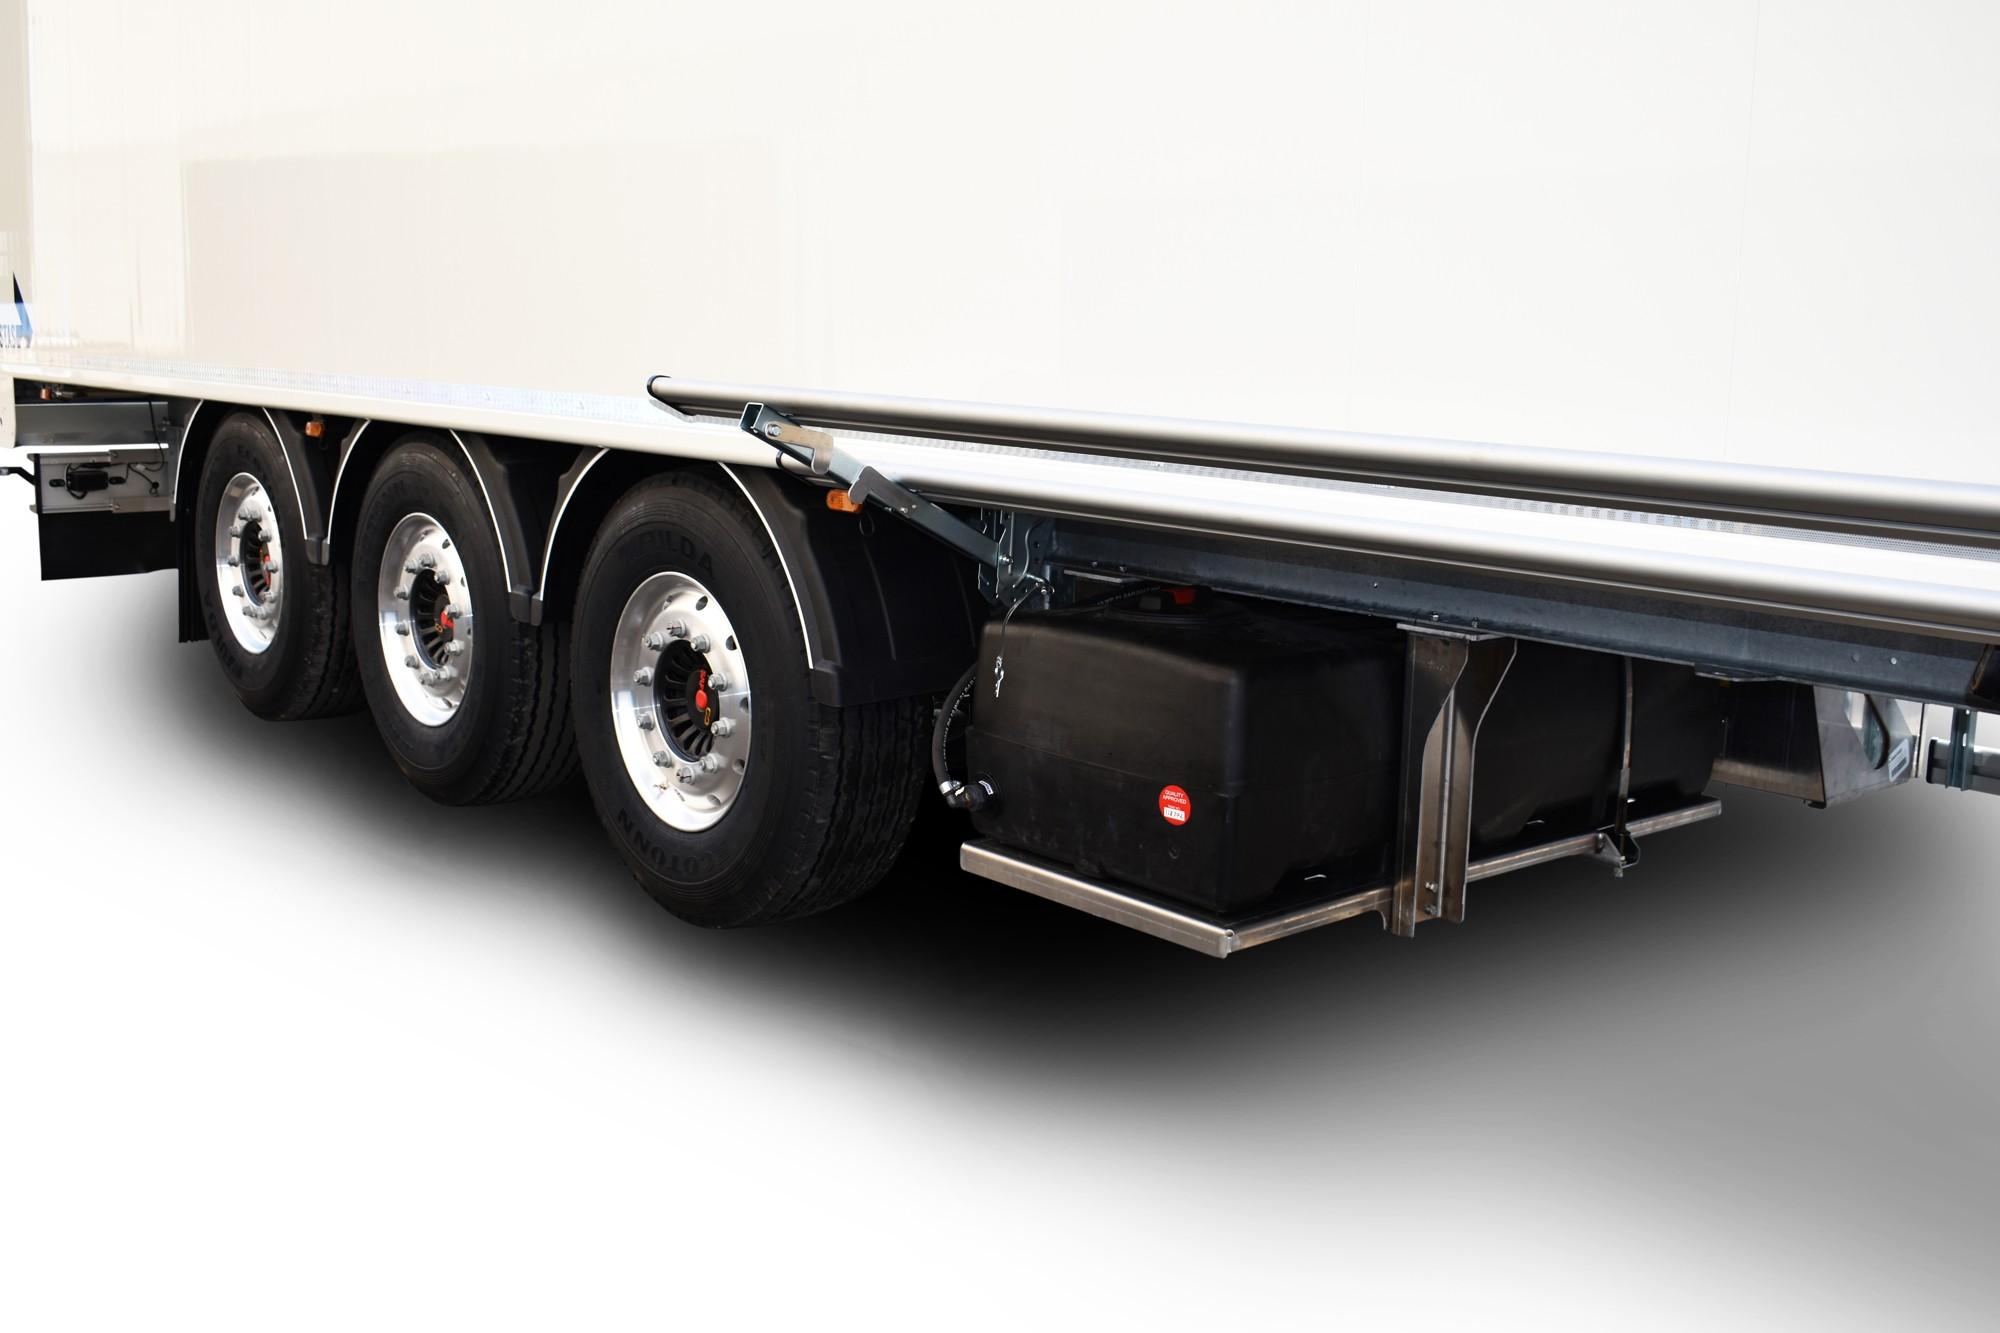 400 litre water reservoir for walking floor trailer